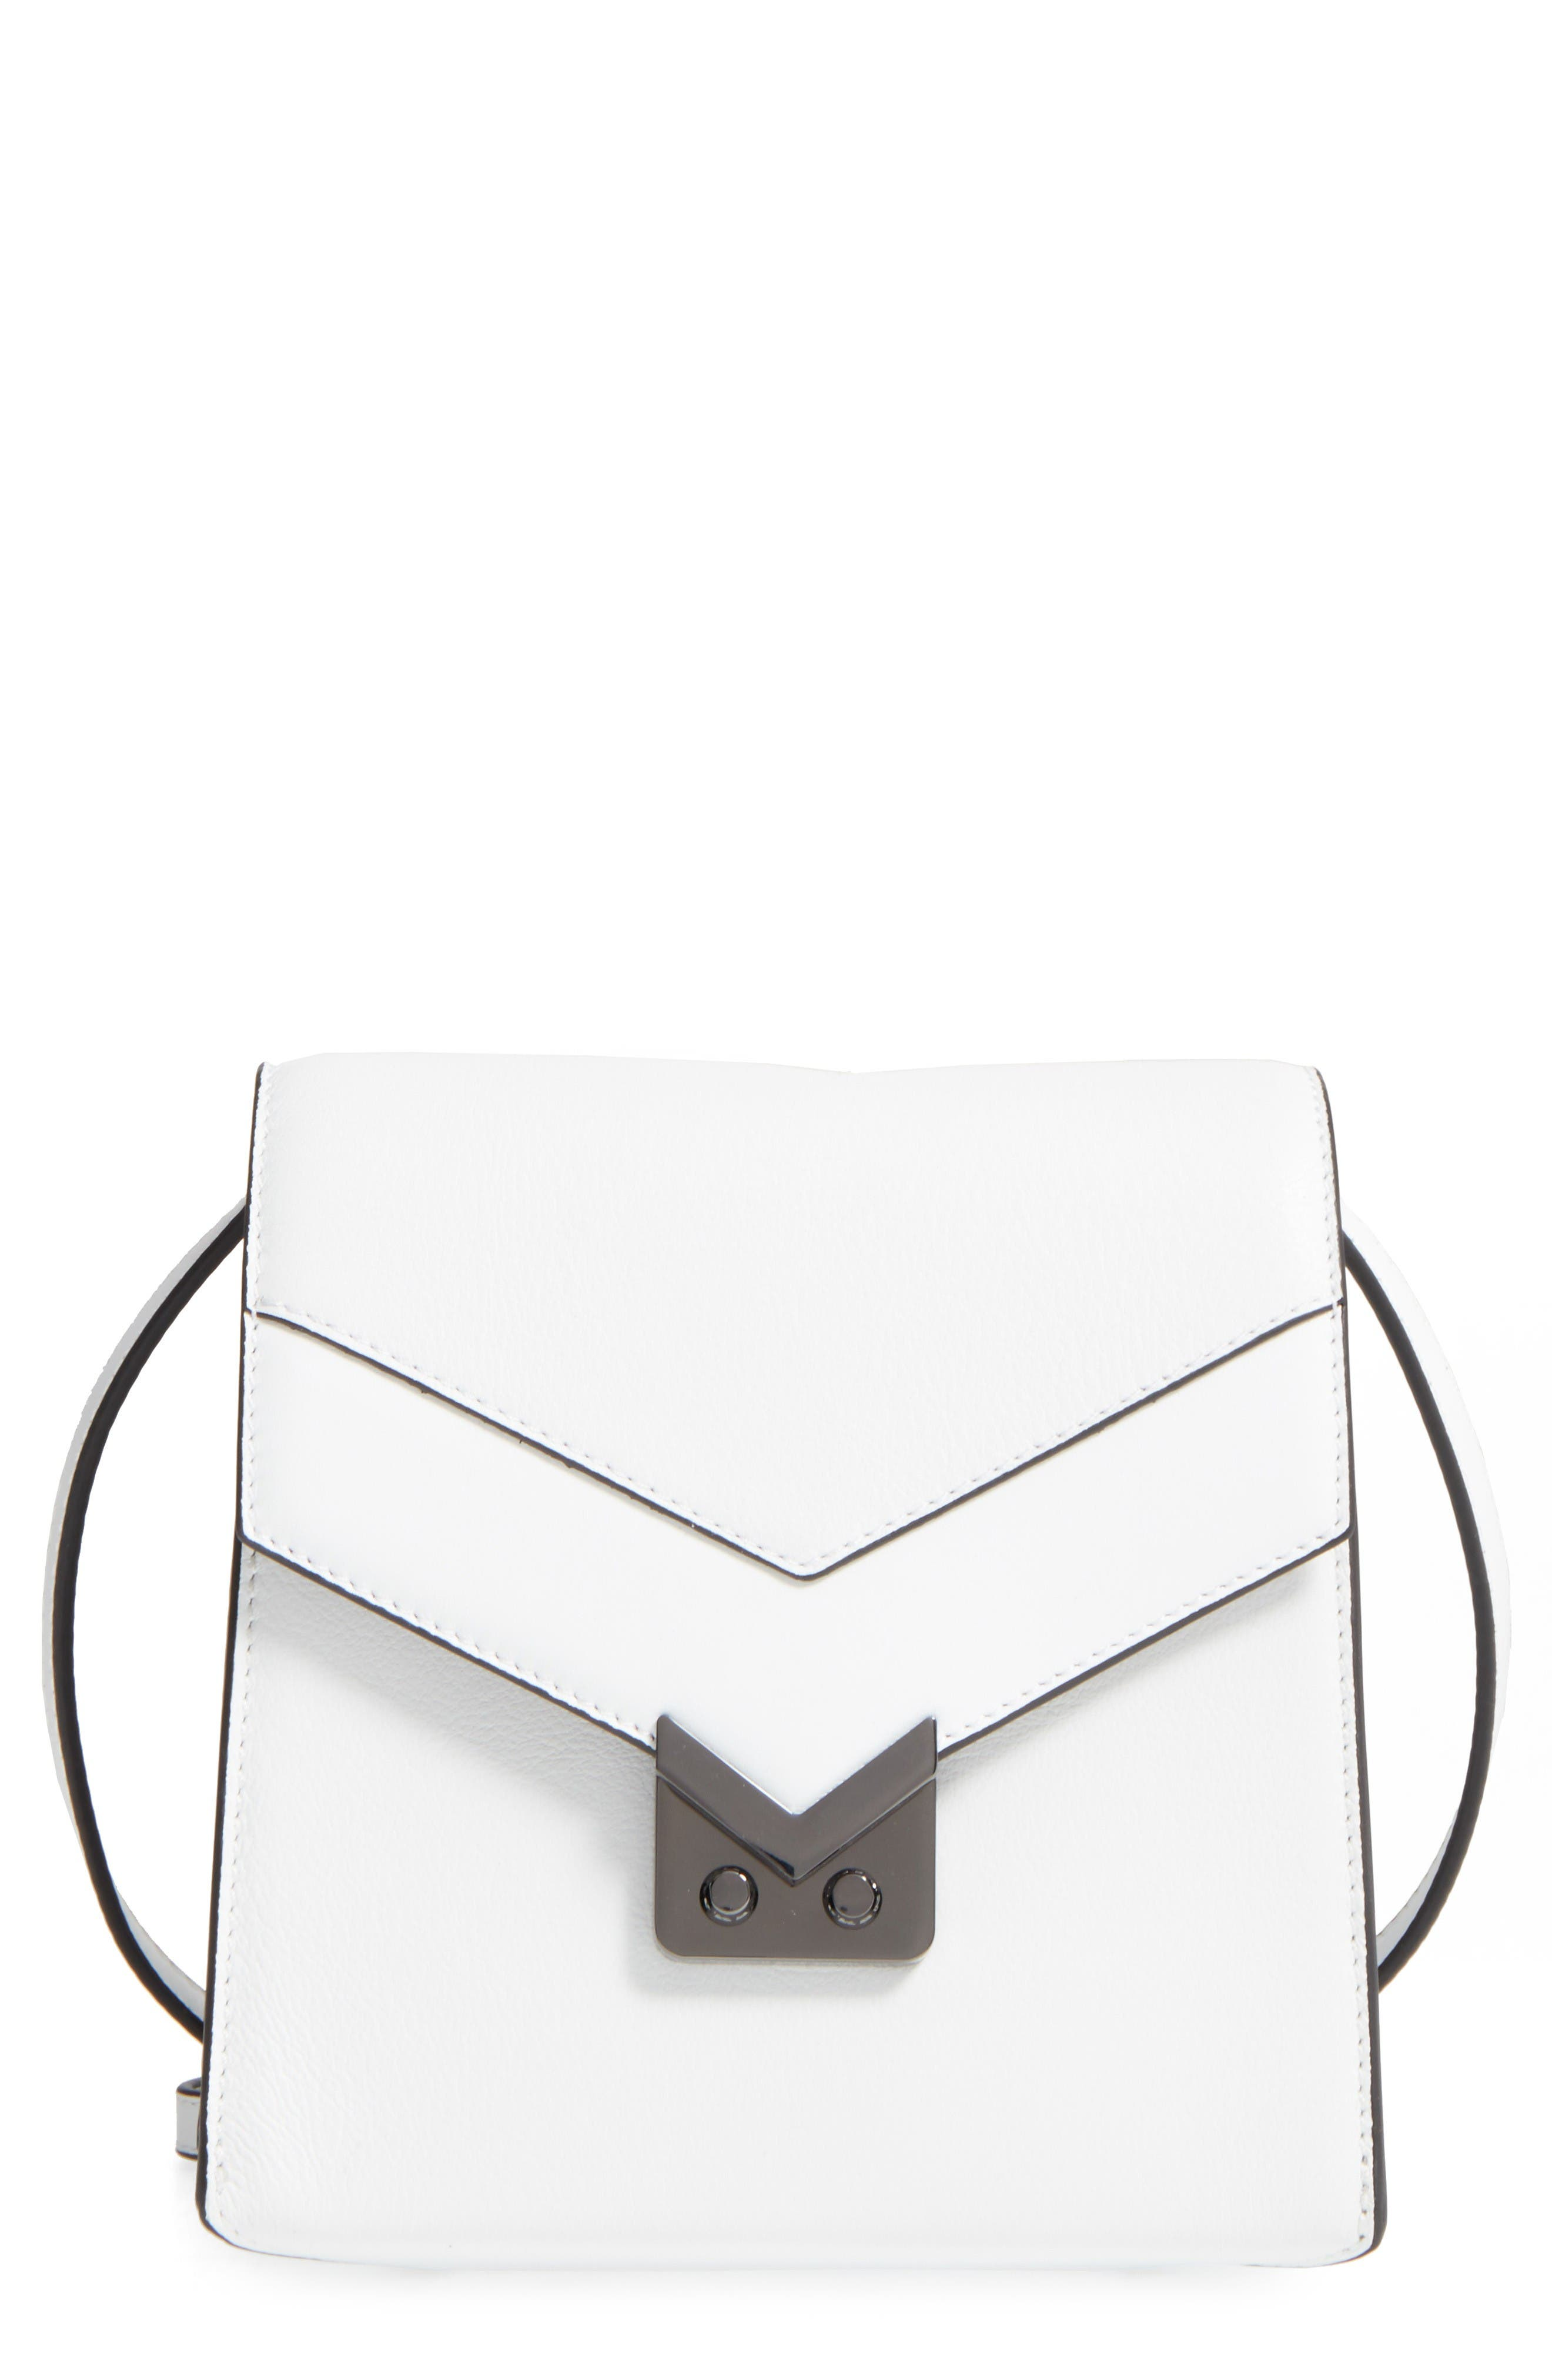 Mackage Yazmin Leather Crossbody Bag